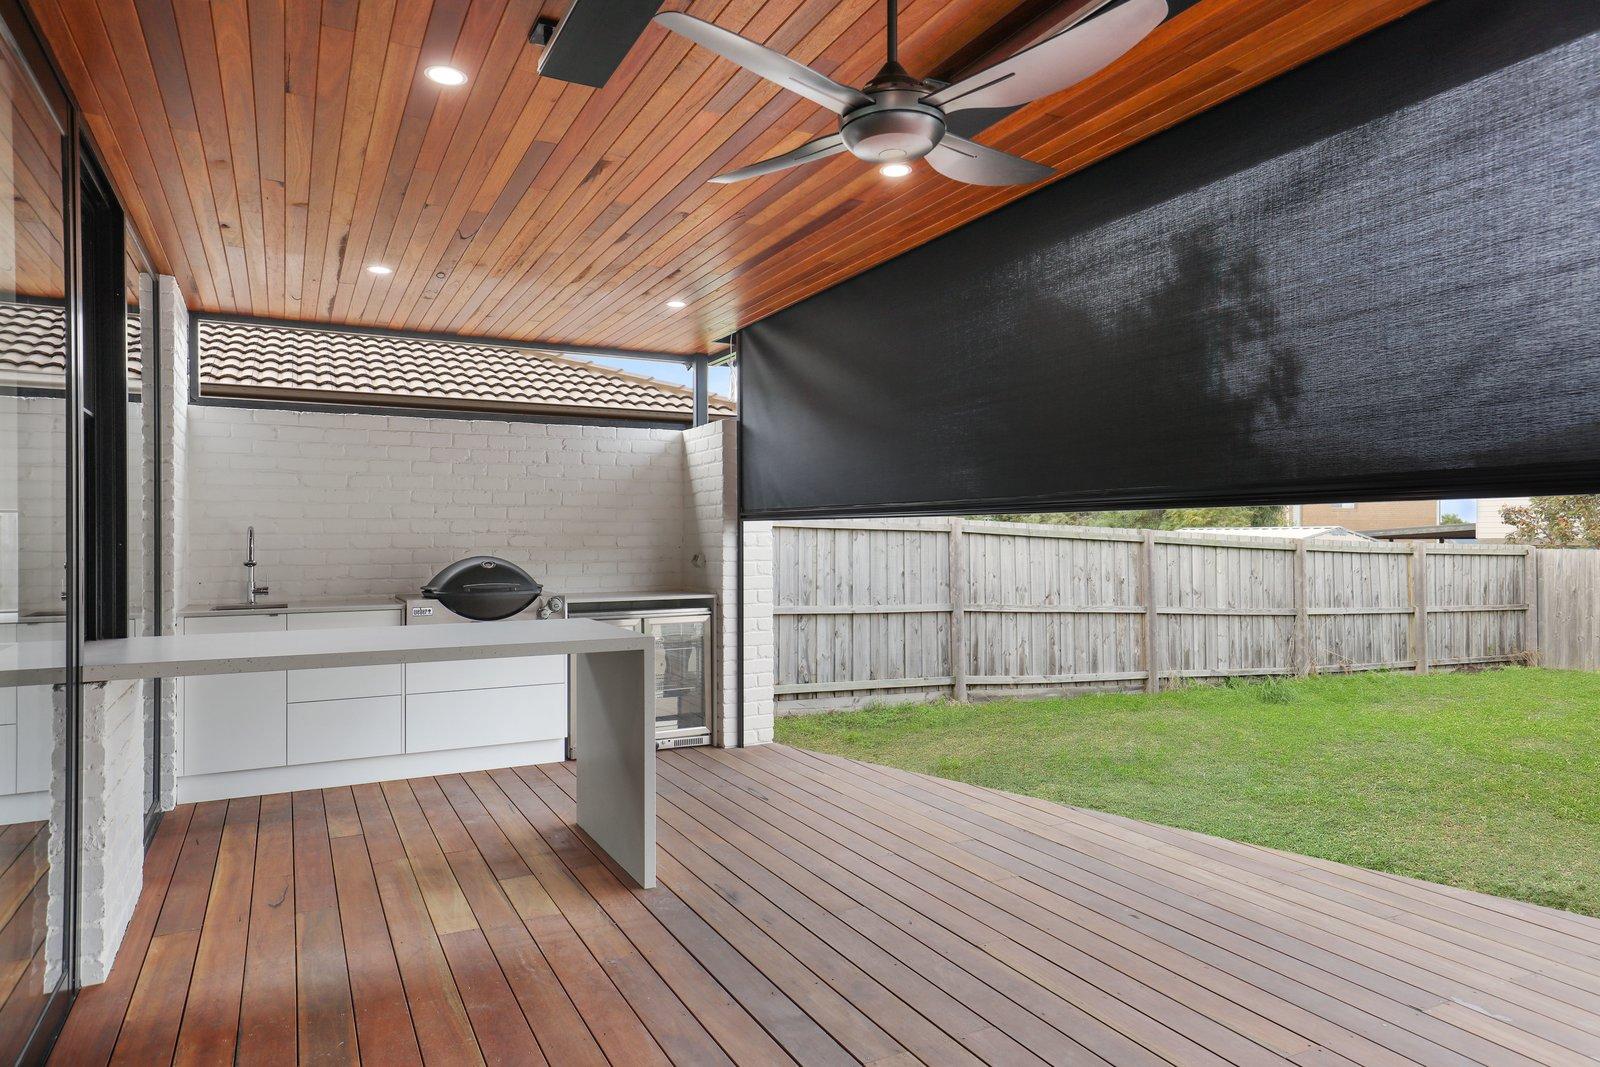 Outdoor, Back Yard, and Decking Patio, Porch, Deck  Tamara Crecsent by Inverloch 3996